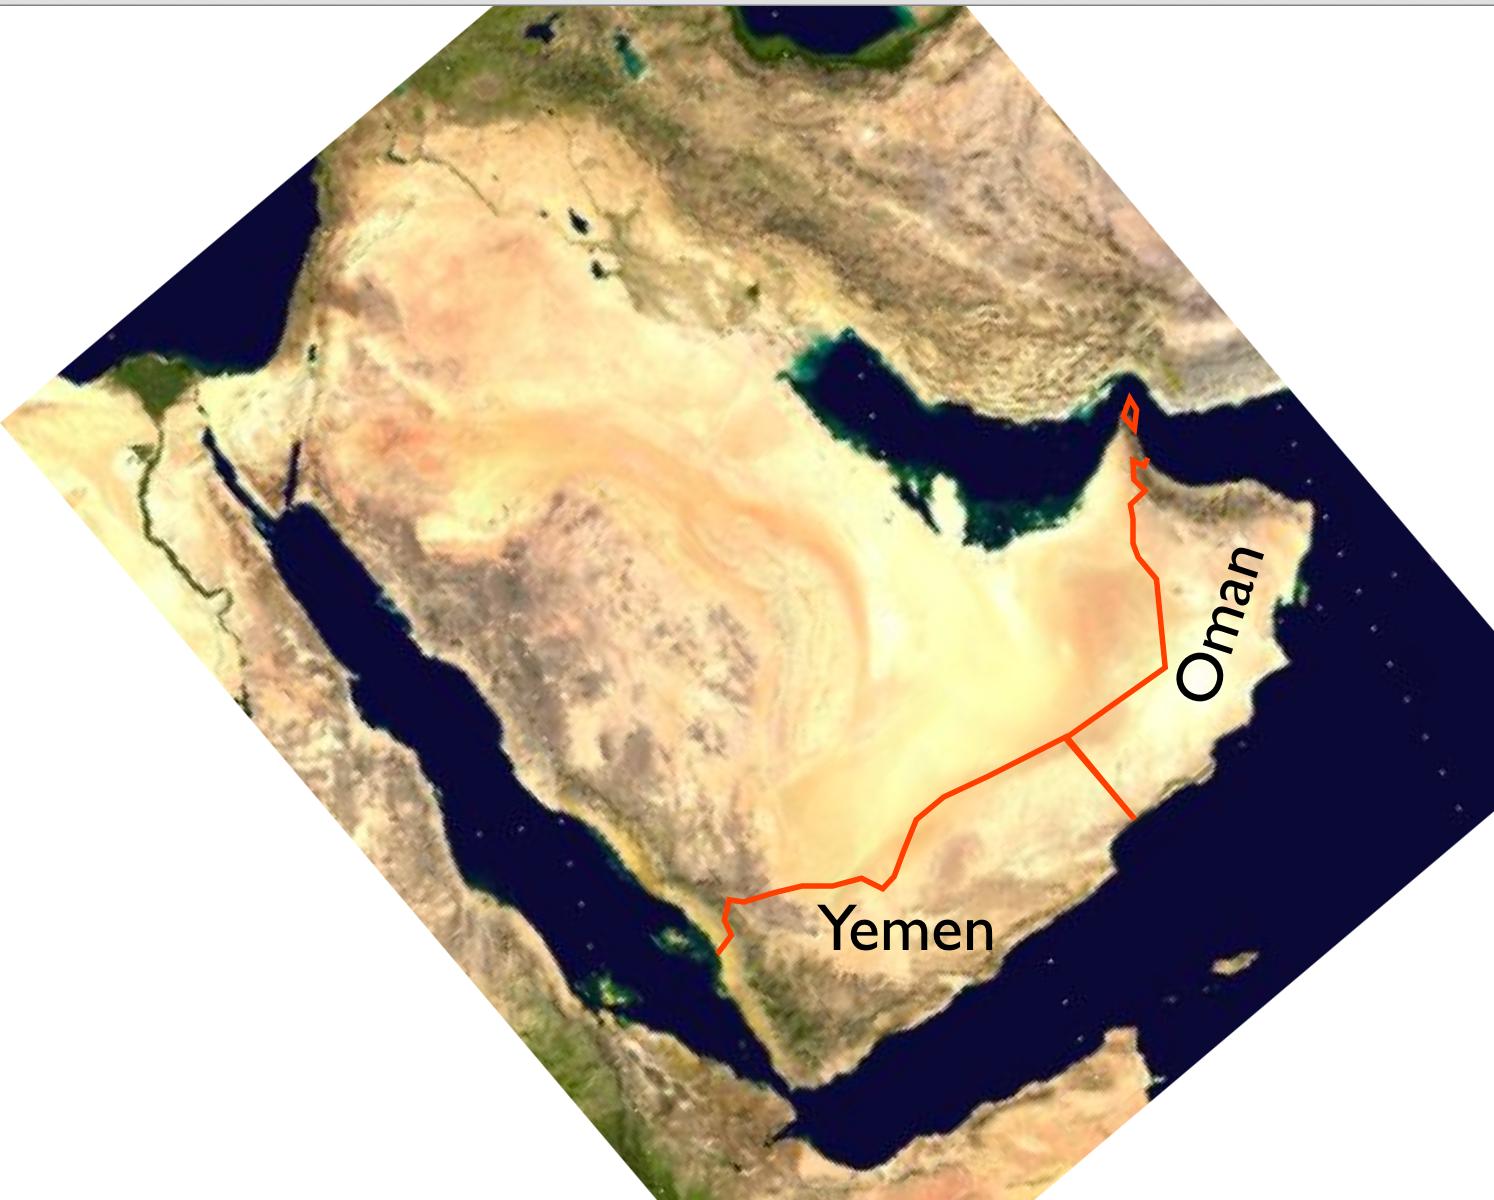 Oman and Yemen Satellite Map Of Yemen on detailed map of yemen, road map of yemen, outline map of yemen, terrain map of yemen, political map of yemen, physical map of yemen, topographic map of yemen,